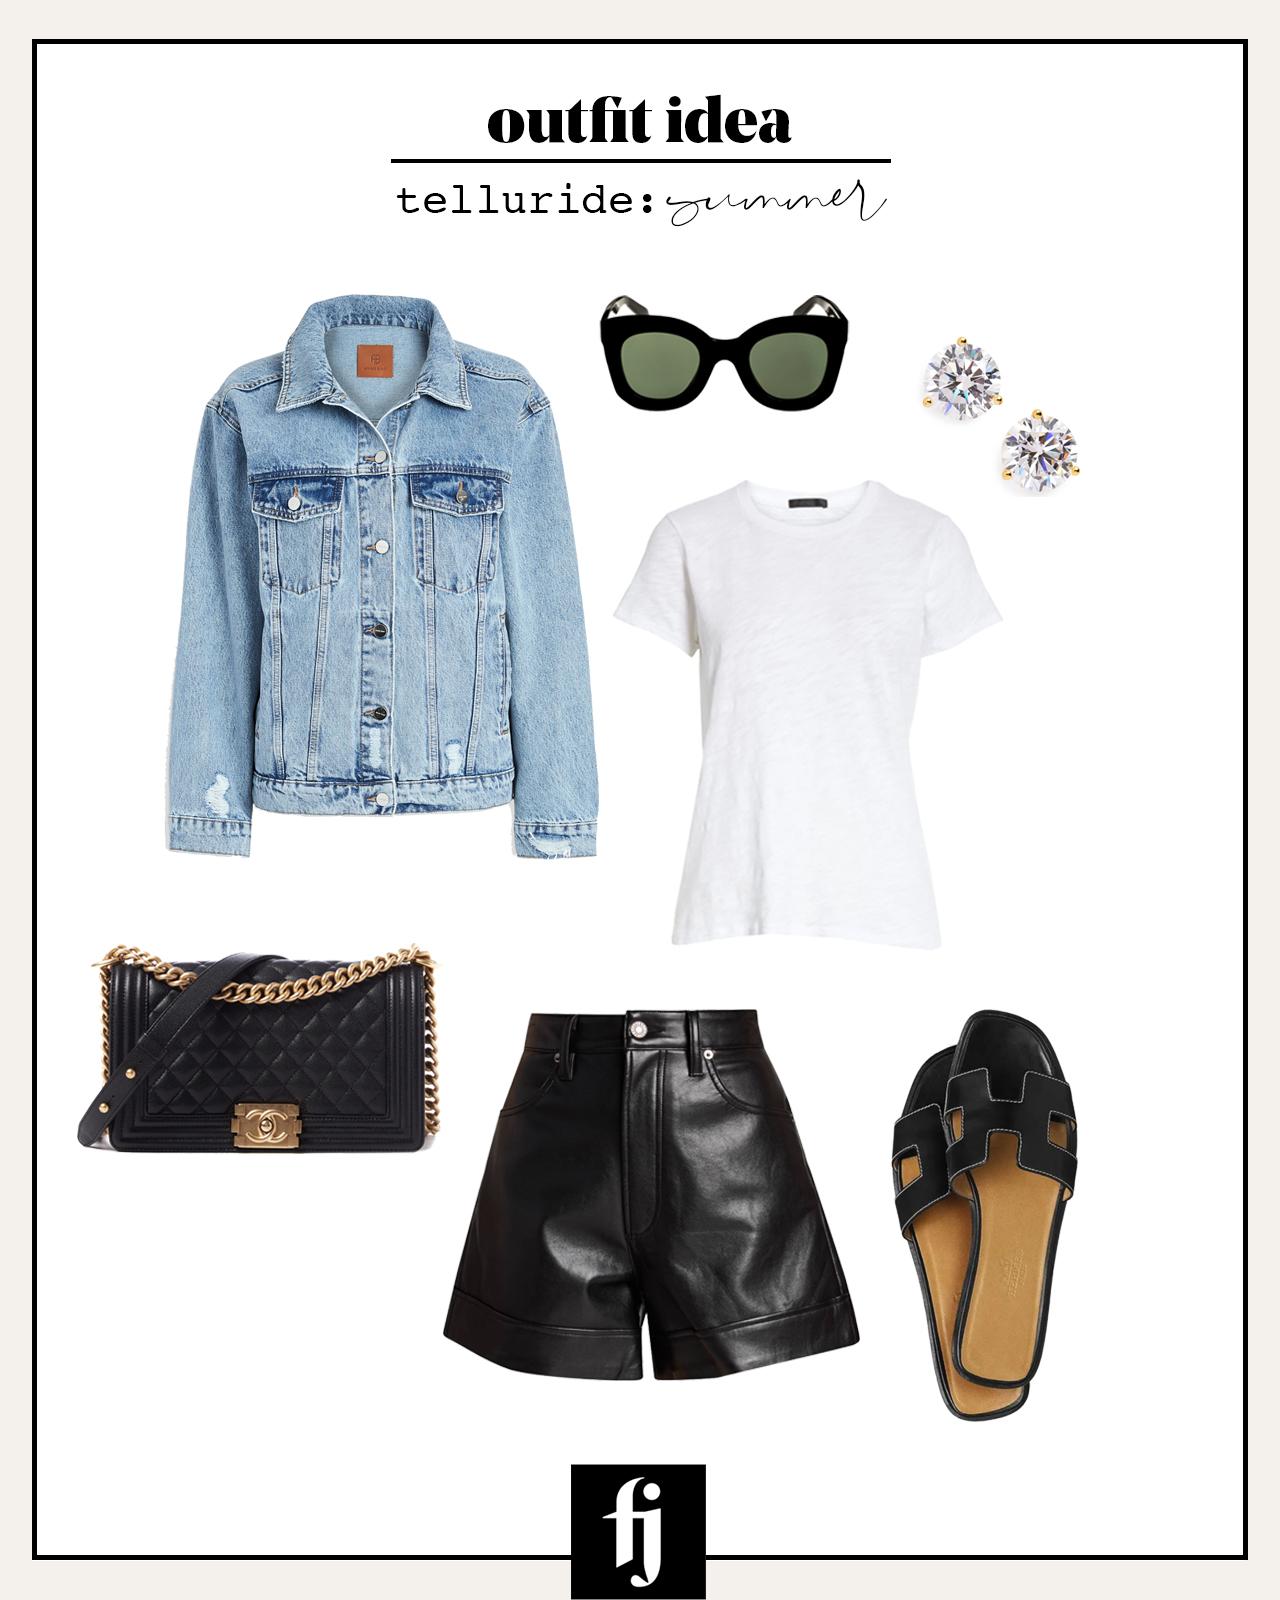 telluride summer outfit idea 3